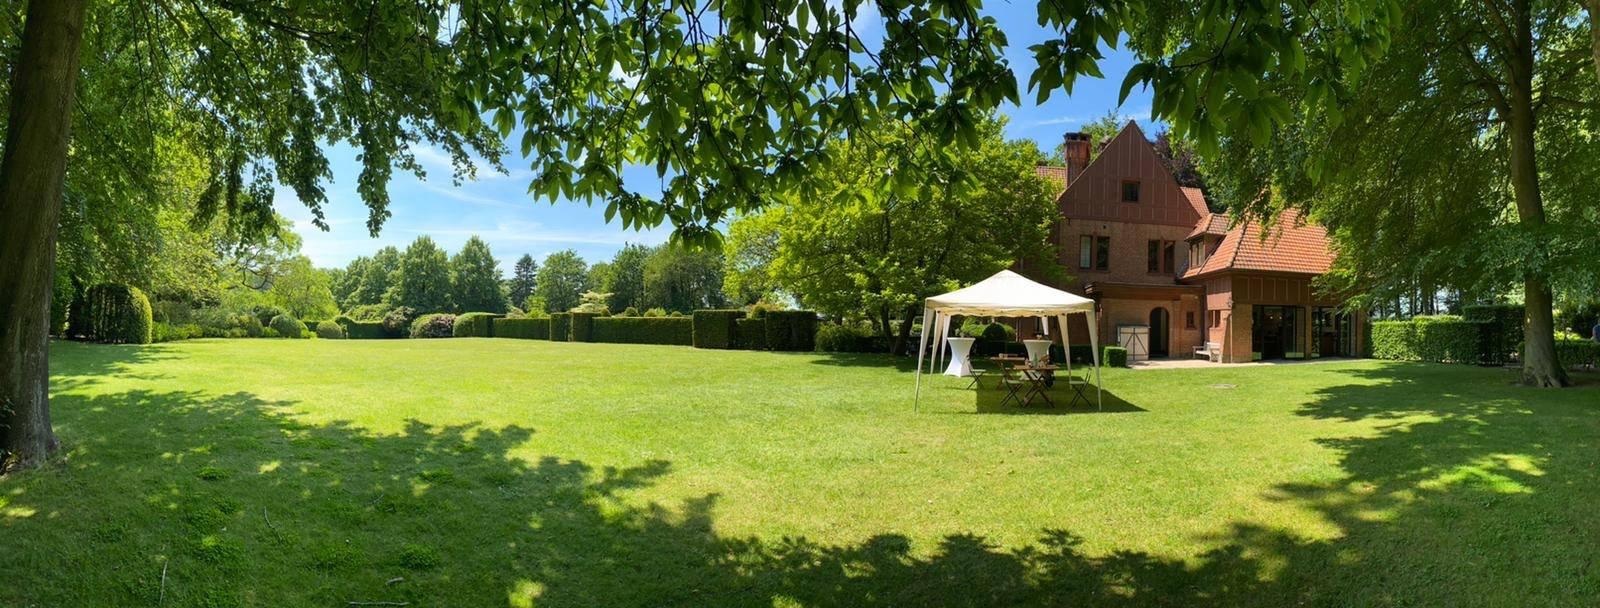 Louise Marie Manor Gardens - Feestzaal - House Of Weddings - 37